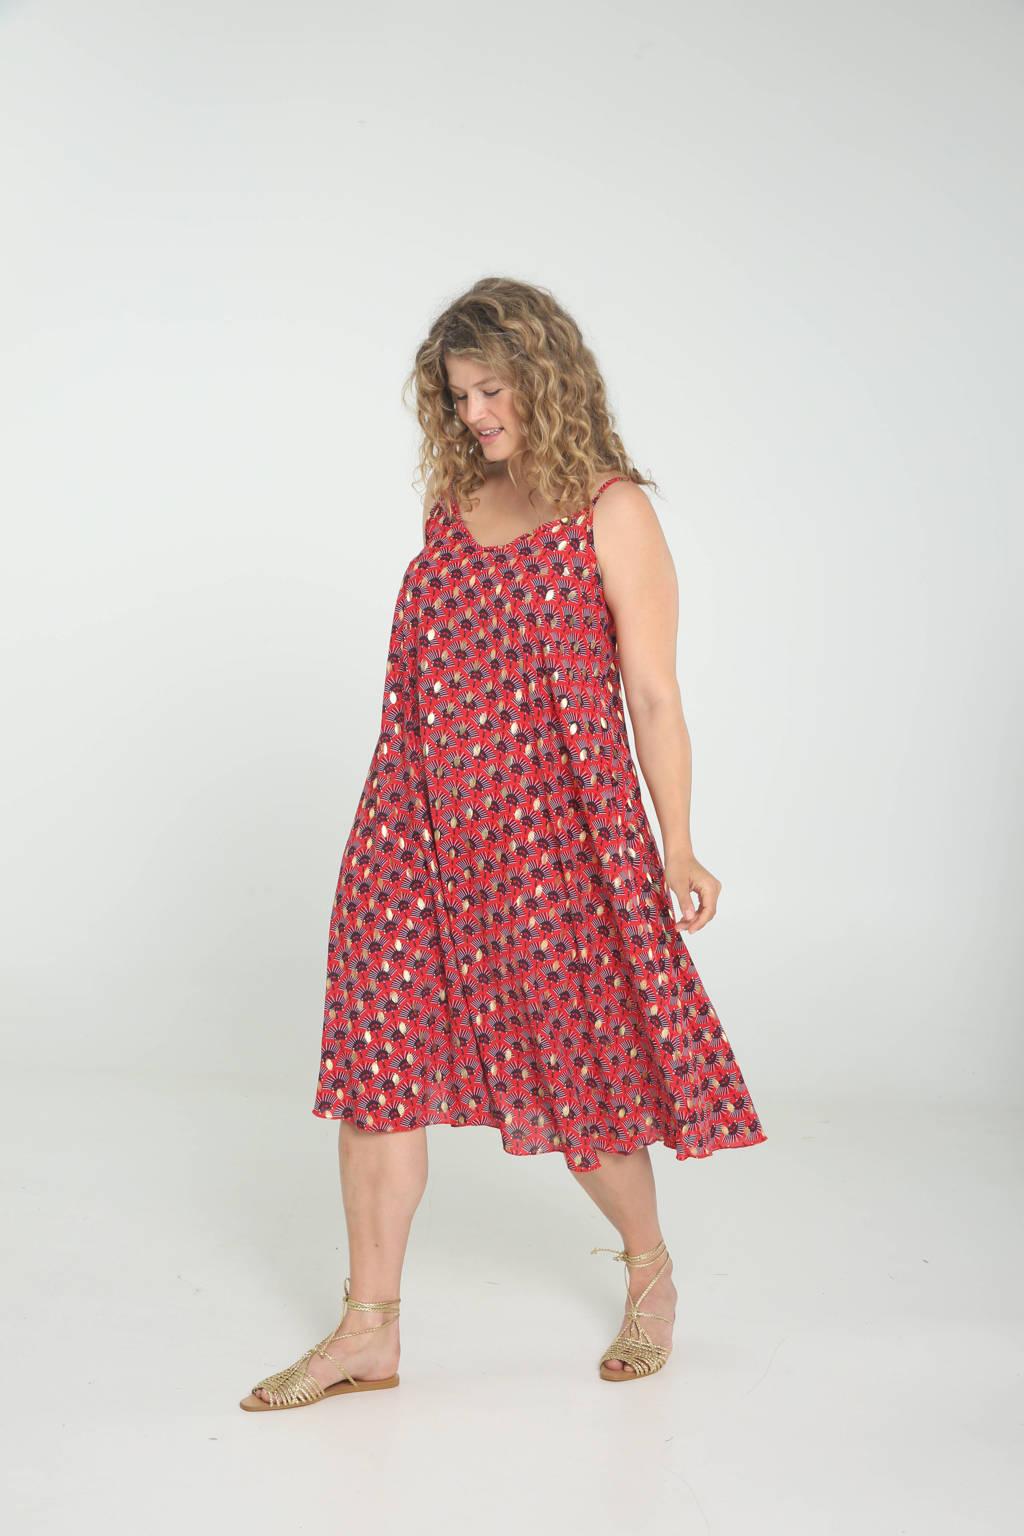 Paprika A-lijn jurk met all over print rood/donkerpaars/goud, Rood/donkerpaars/goud